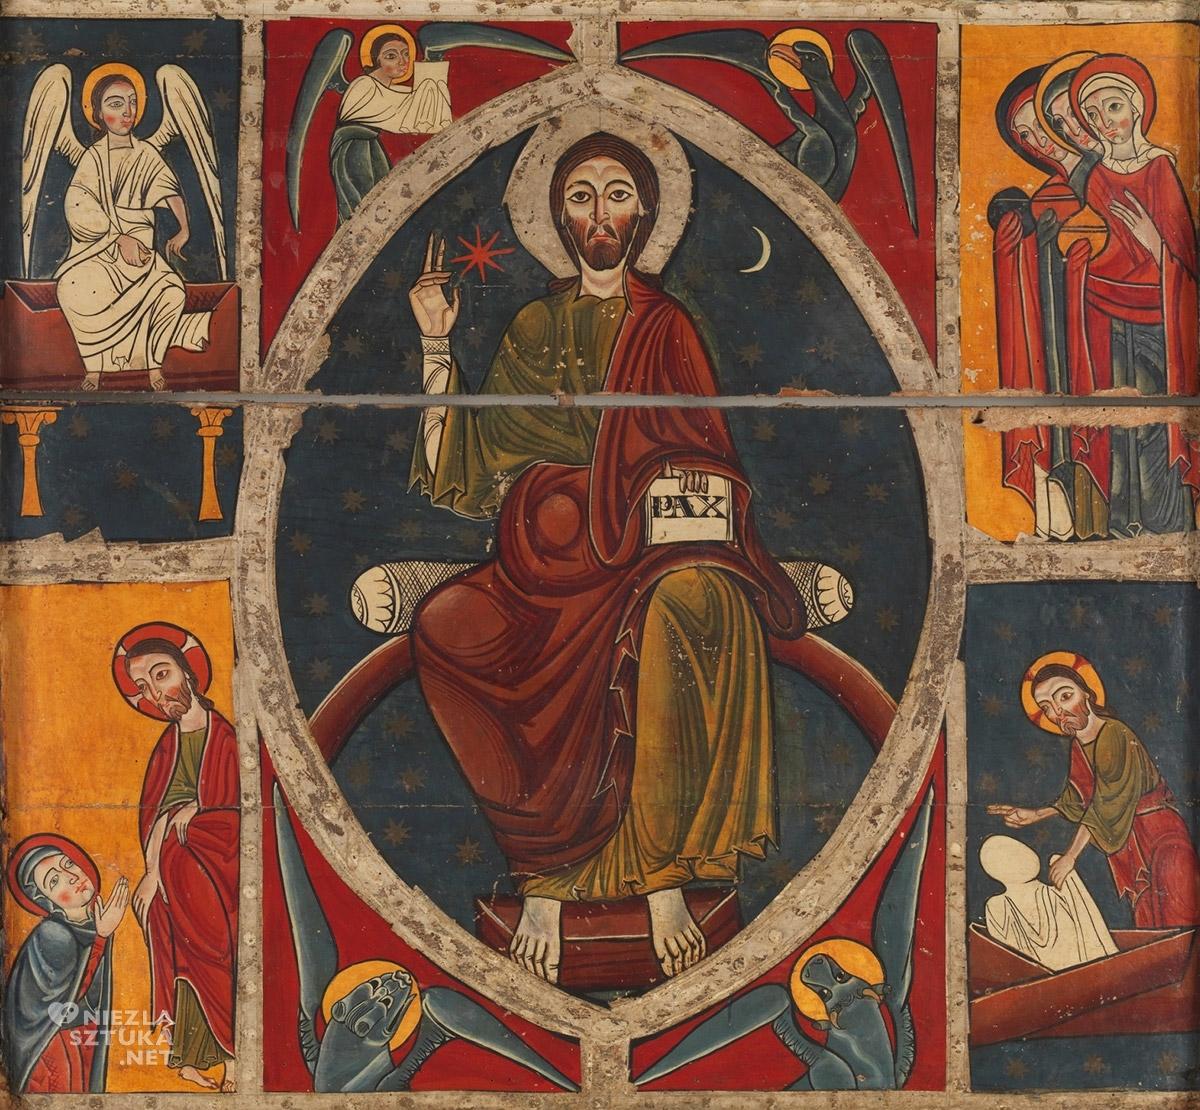 Tetramorfa, Chrystus, Ewangeliści, Prado, Madryt